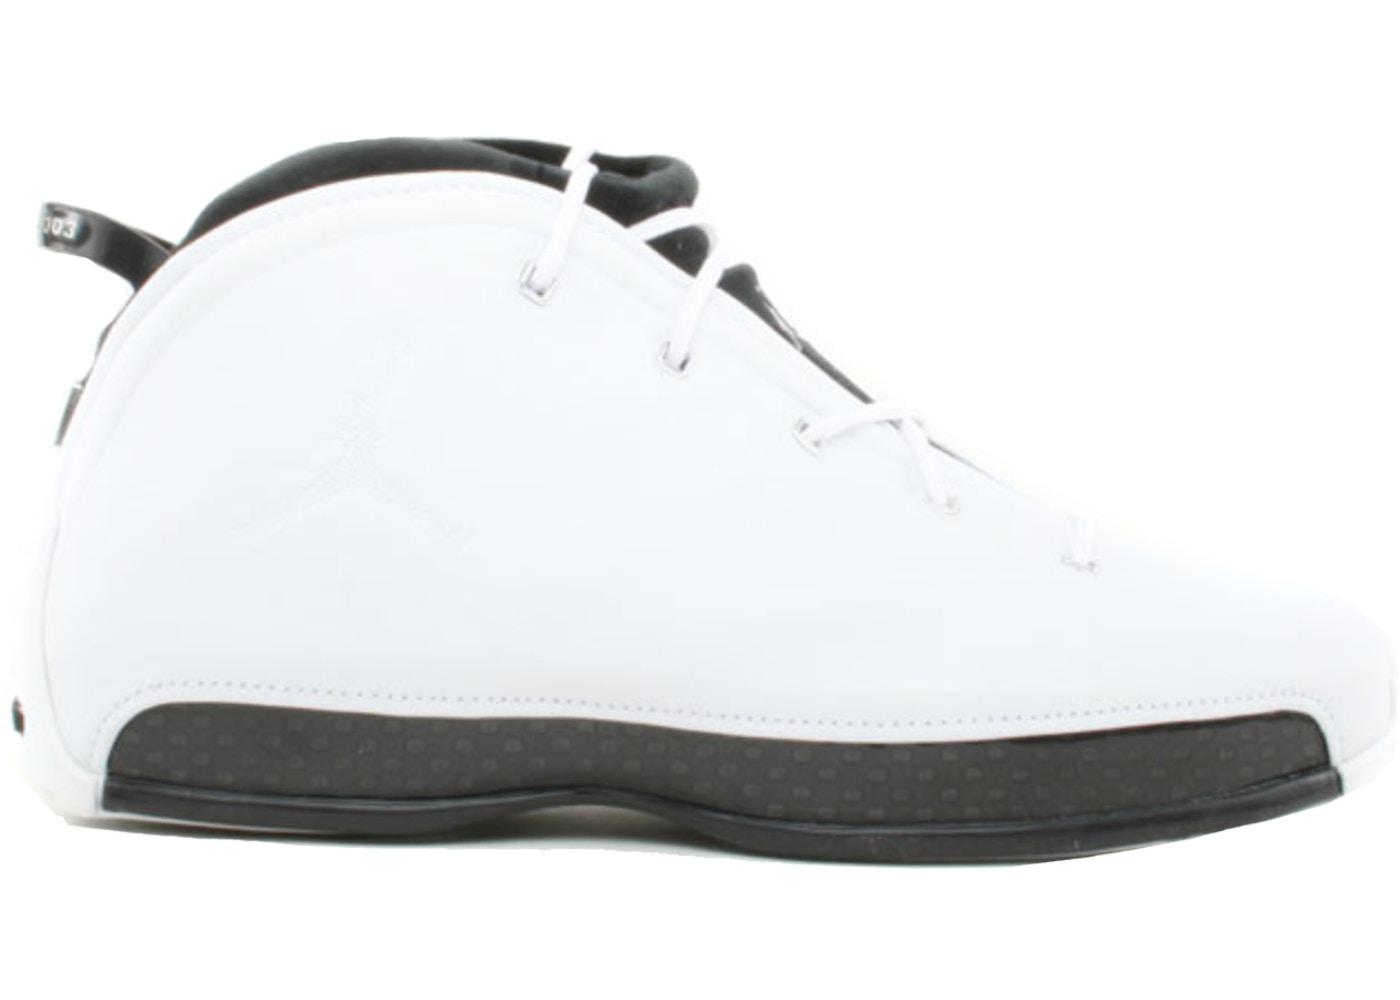 5b3d6a18a798c9 Buy Air Jordan 18 Shoes   Deadstock Sneakers